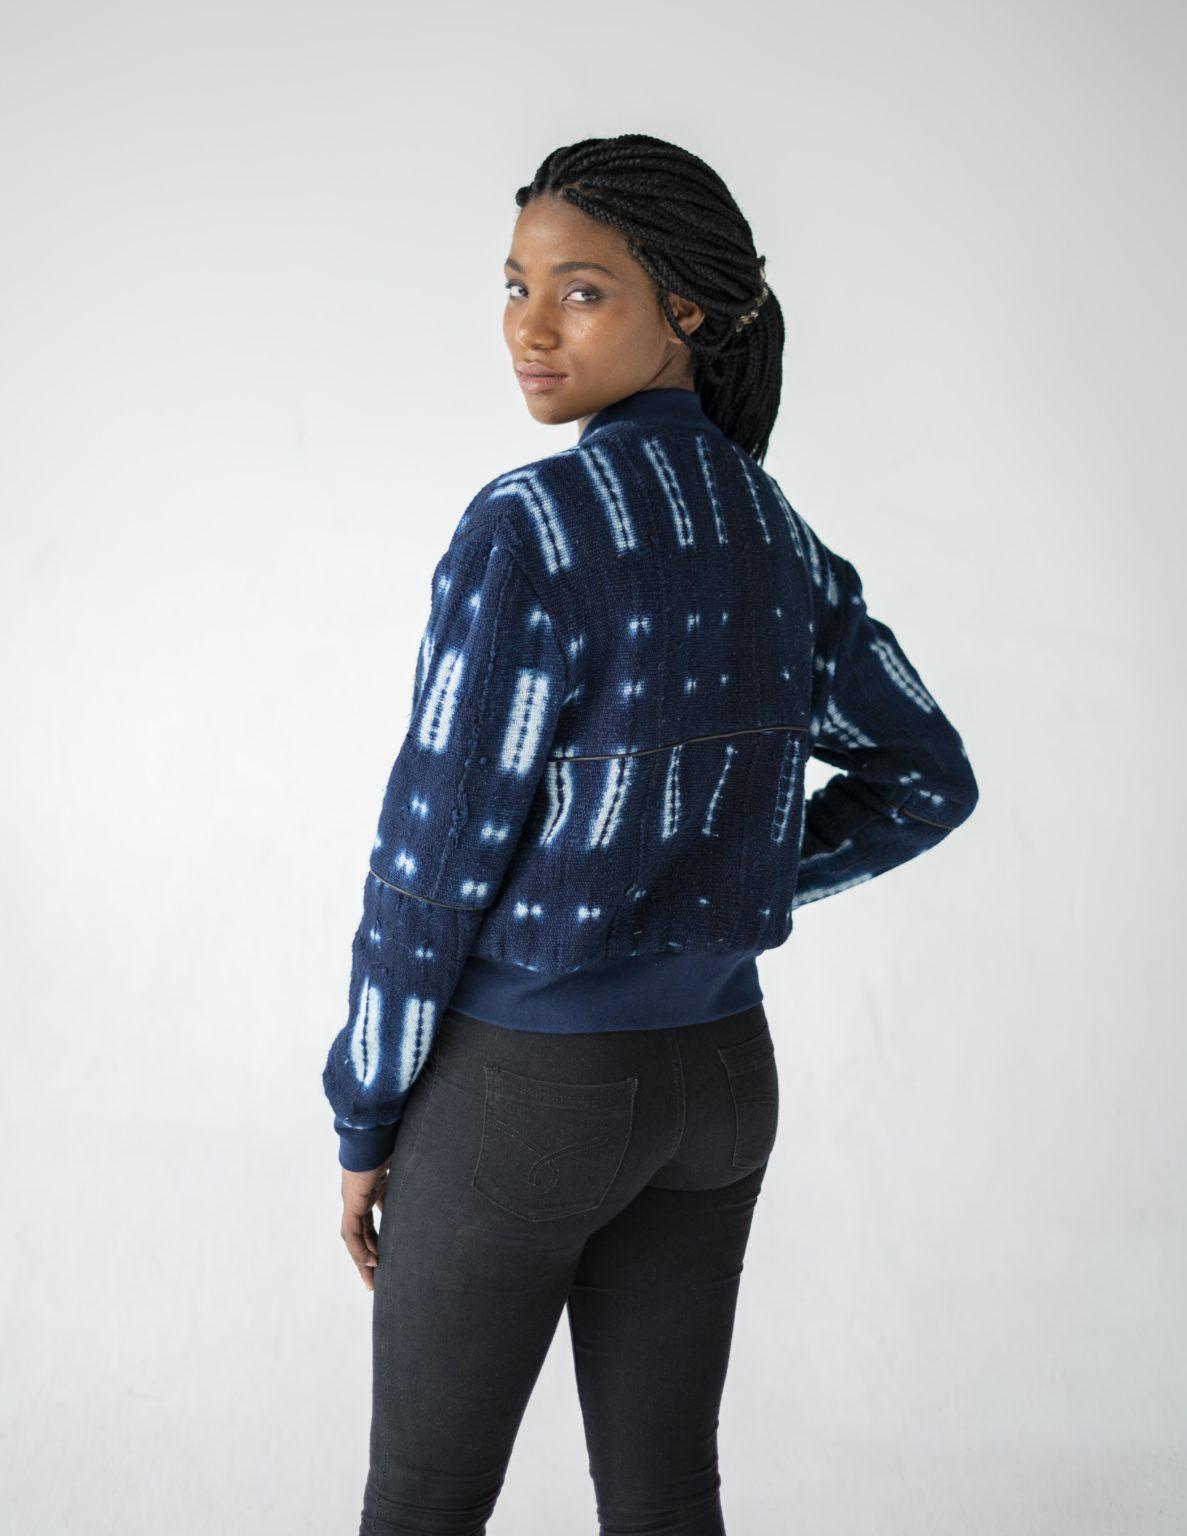 Ethical fashion model Utamu